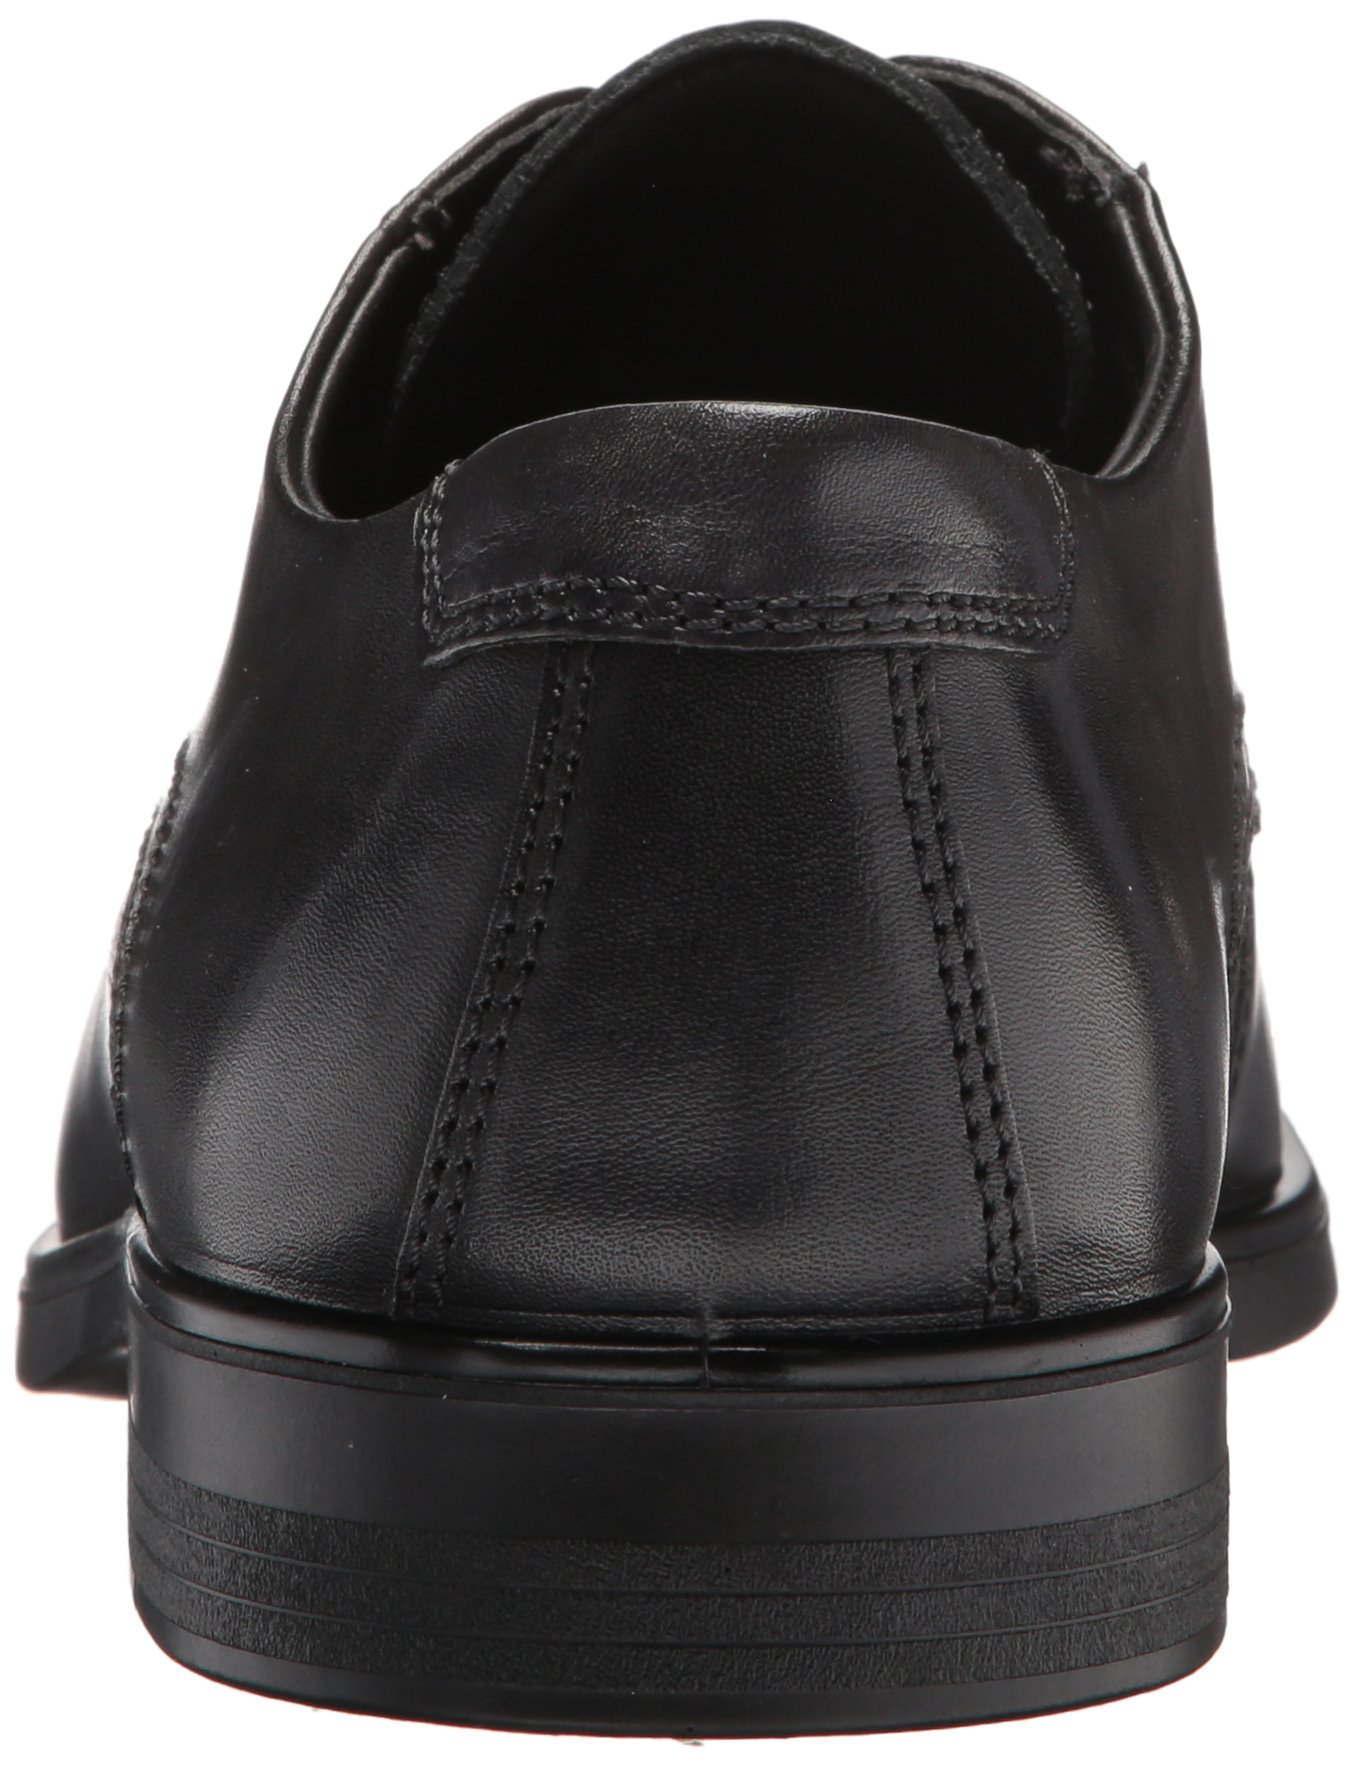 ECCO Men's Melbourne Tie Oxford, Black/Magnet, 43 EU/9-9.5 M US by ECCO (Image #2)